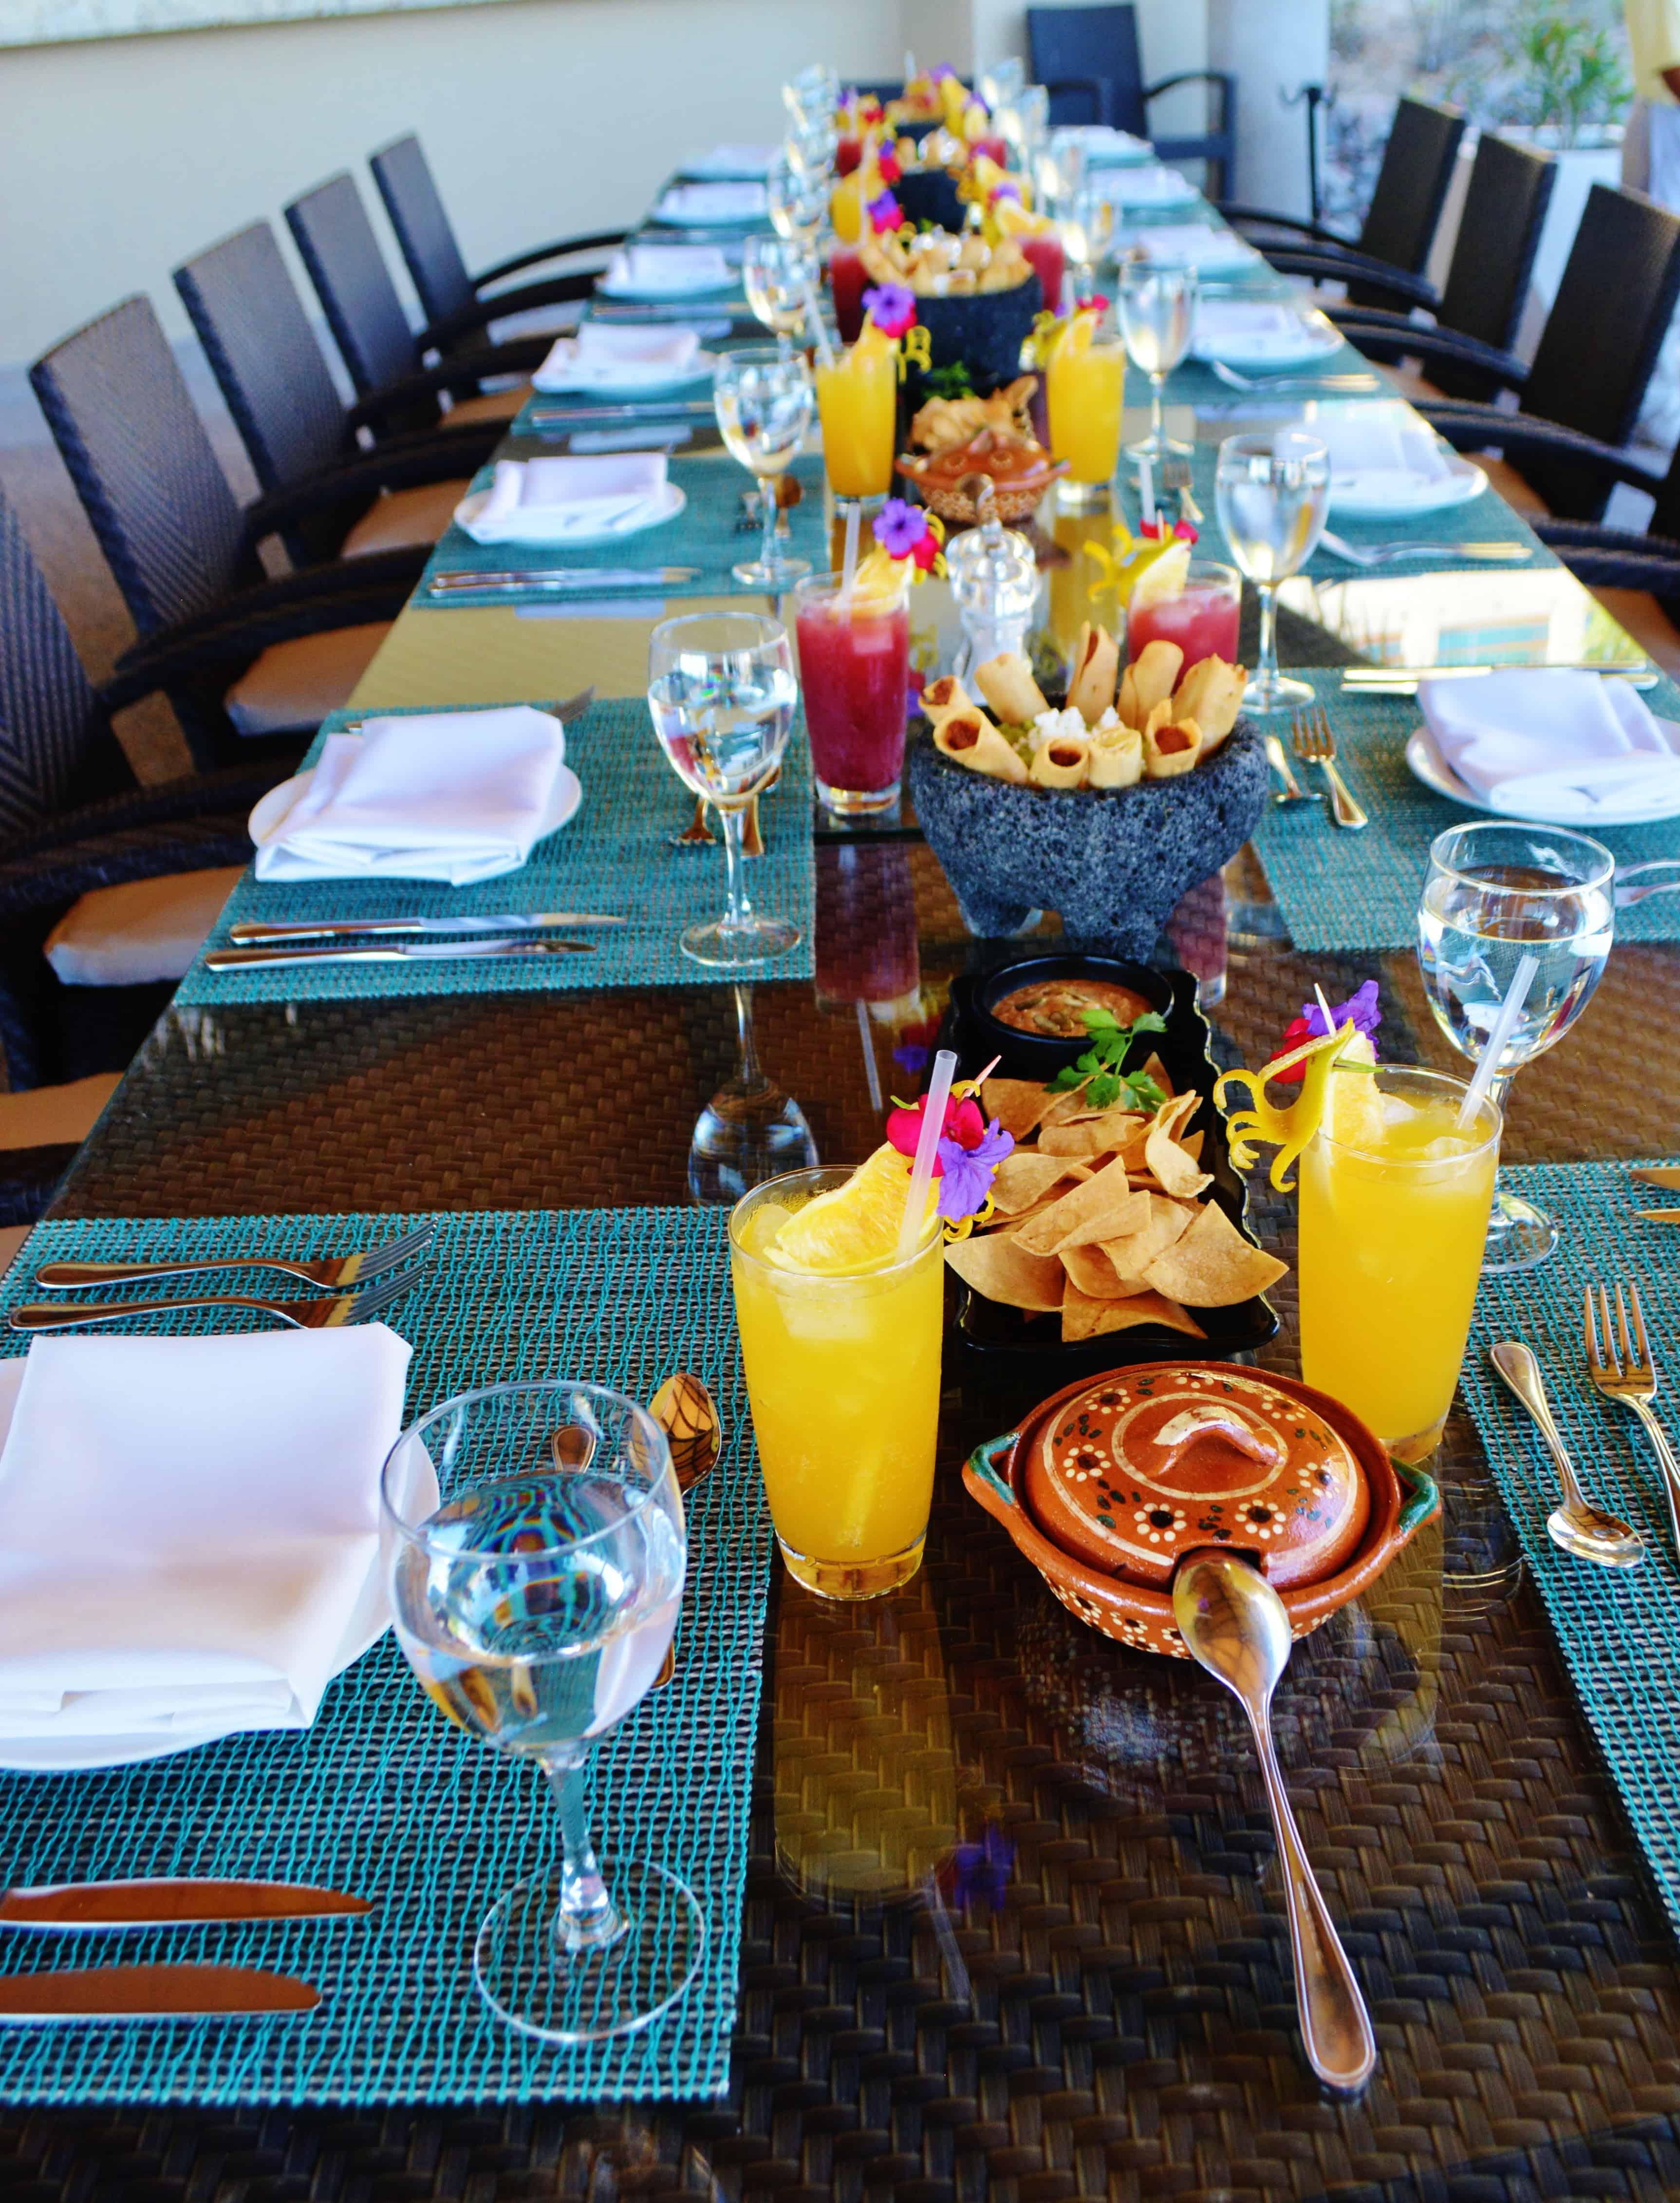 Magnificent Table Settings at Ola Mulata